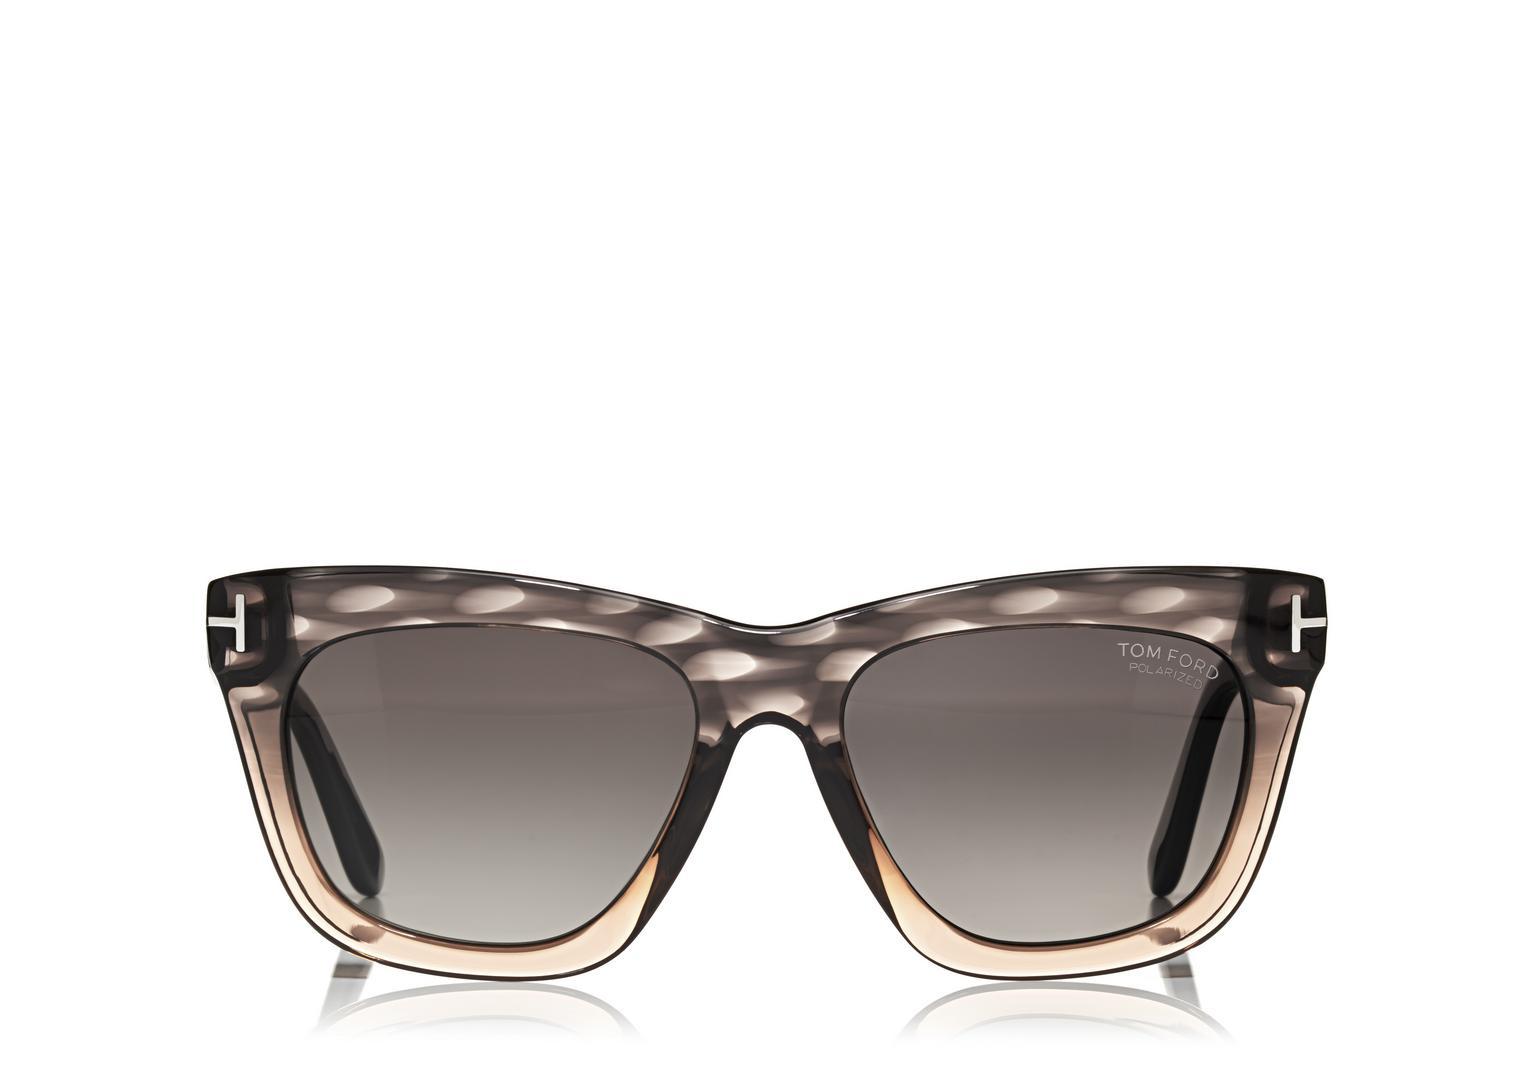 a30d2771b8 Tom Ford William Sunglasses Polarized